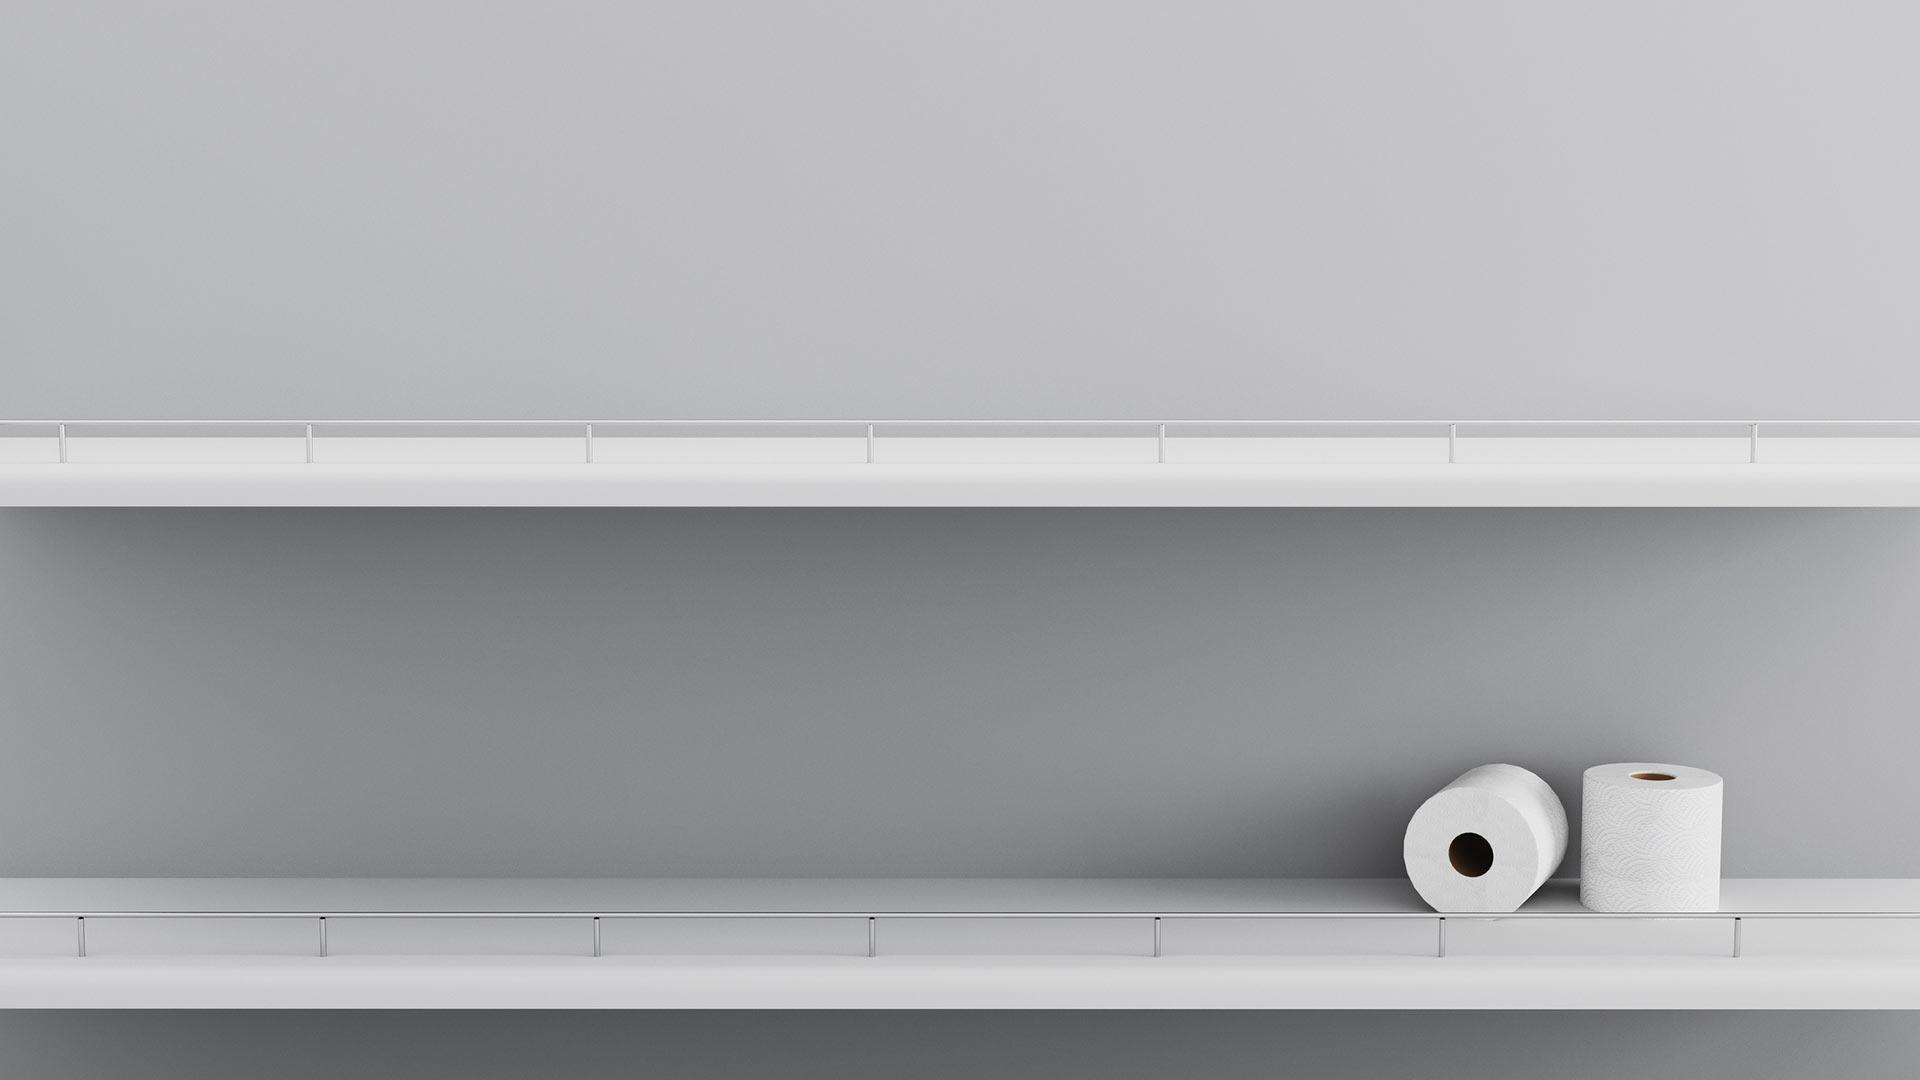 Two rolls of toilet paper on shelf